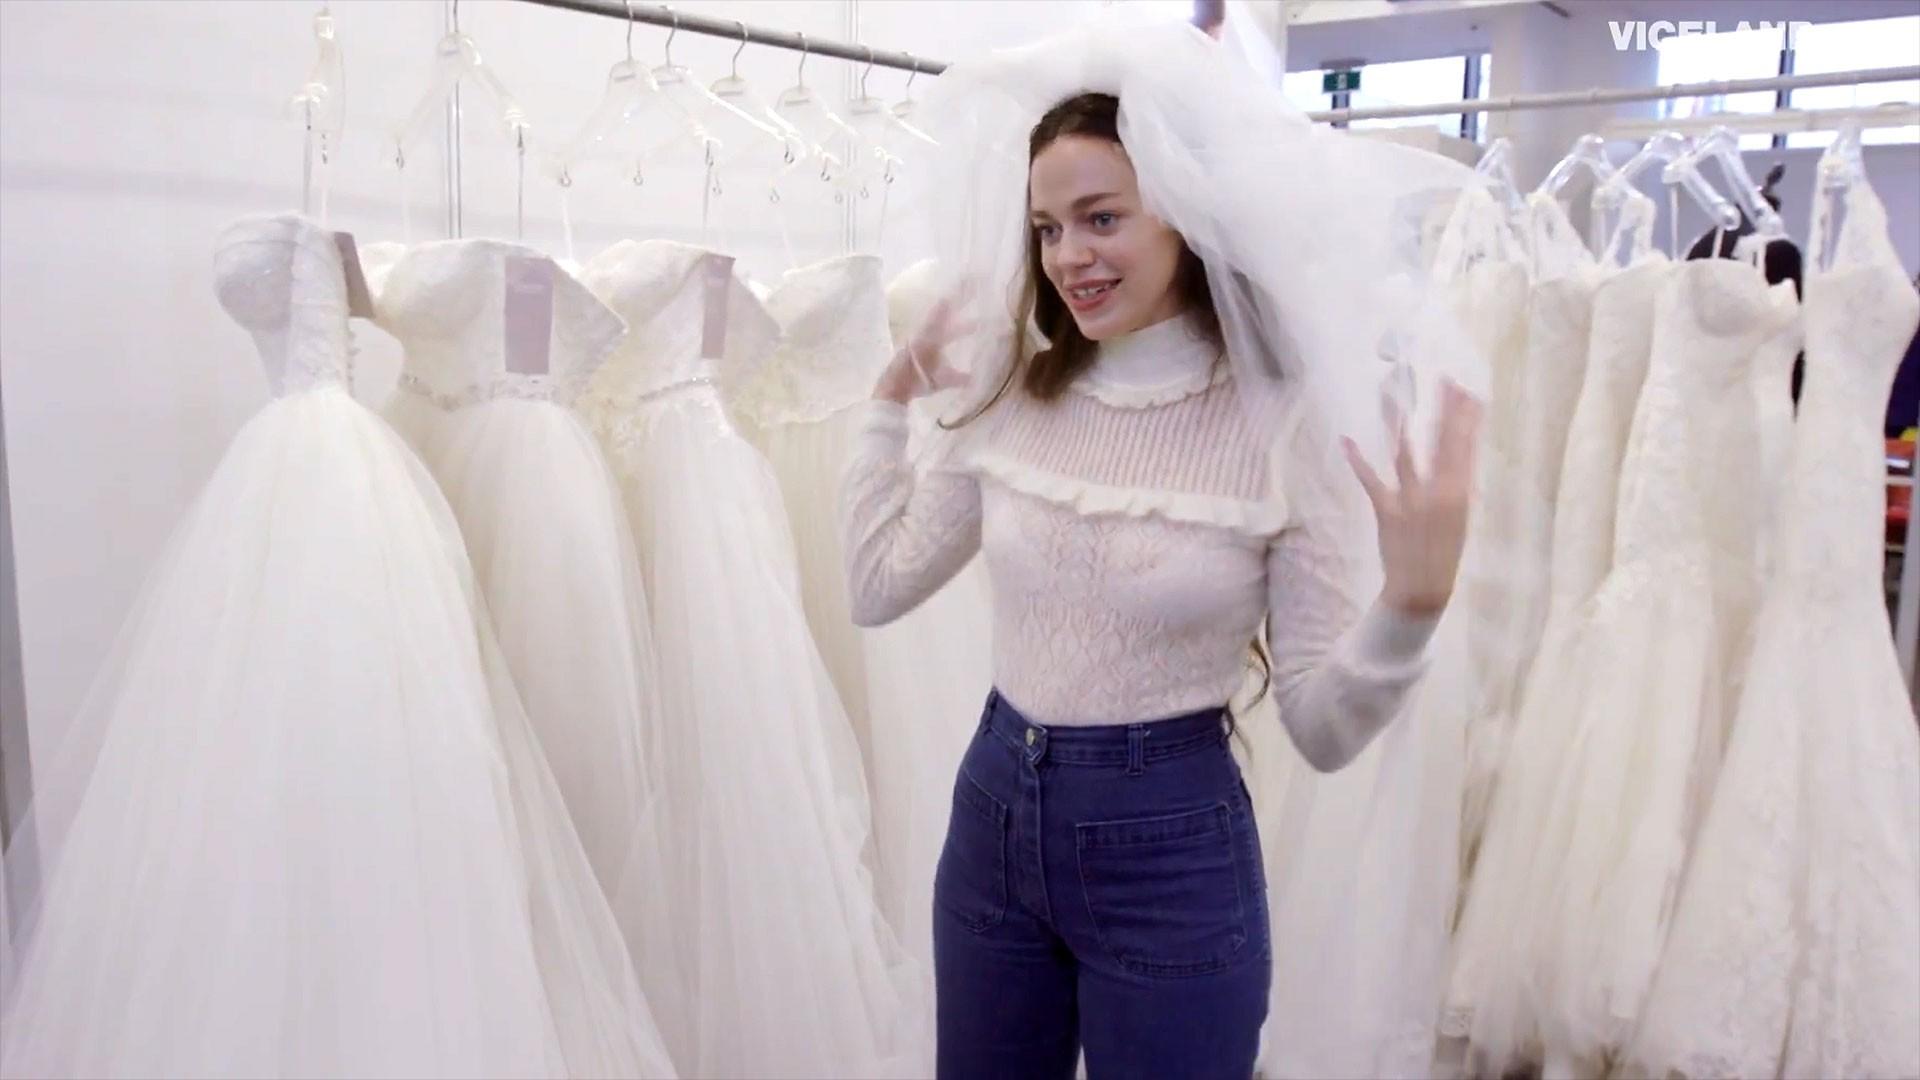 Romanian mail order brides